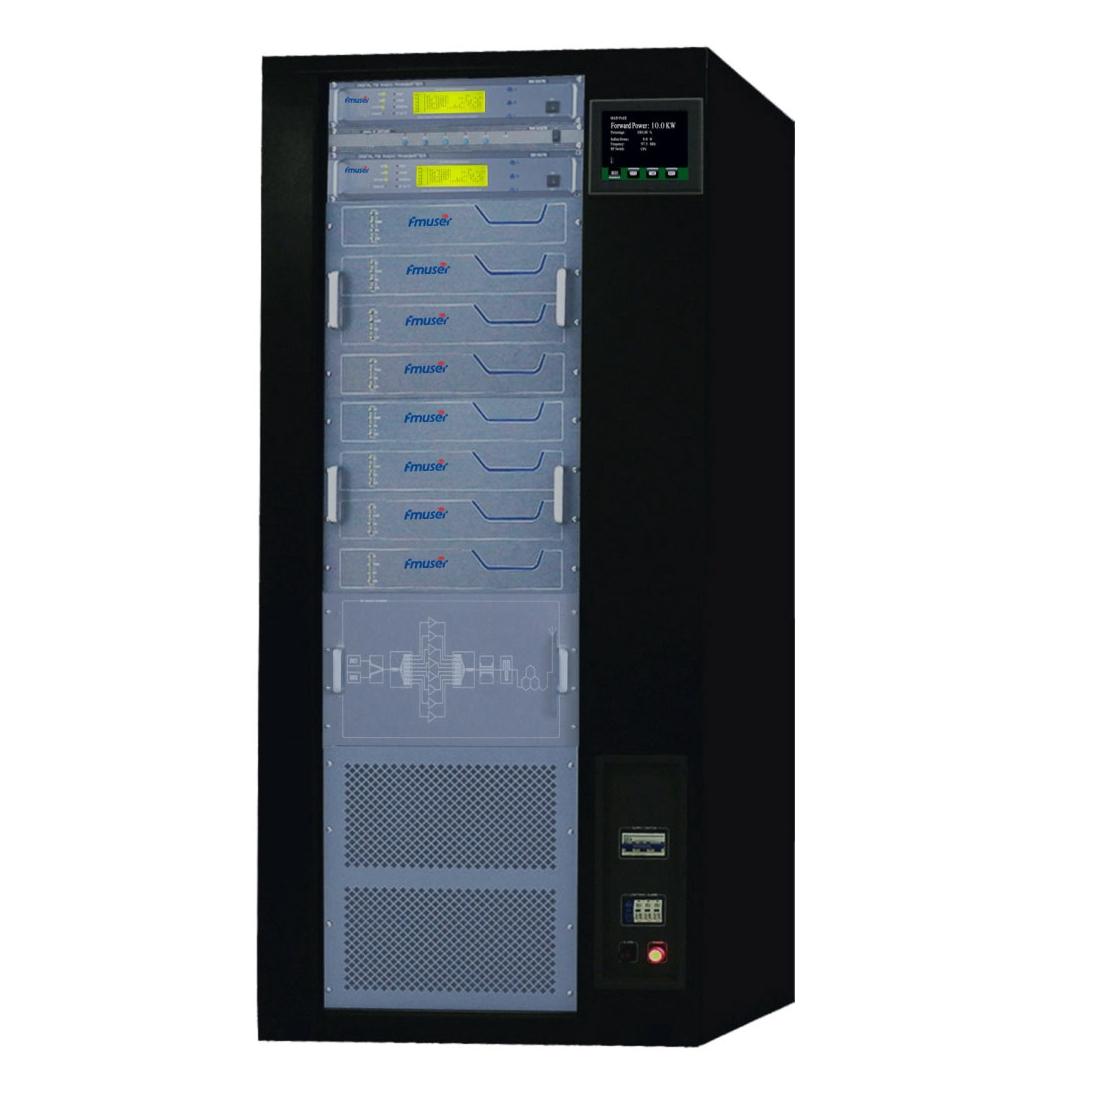 emițător CZH618F-10KW Professional FM 10000w emisiune de radio FM transmițător excitator